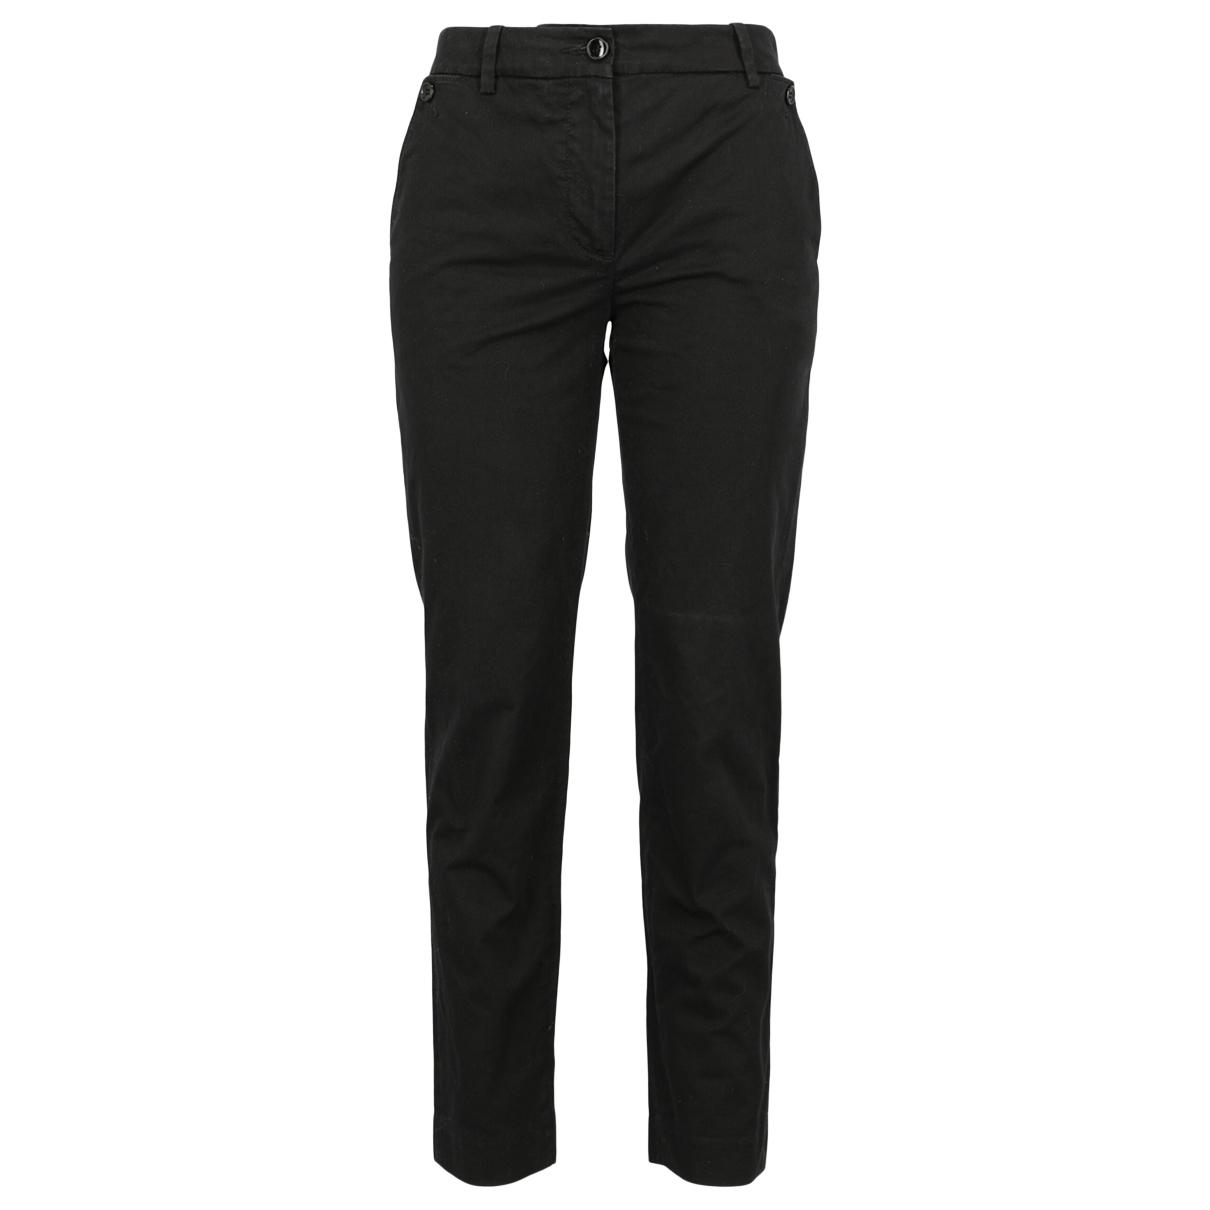 D&g \N Black Cotton Jeans for Women 40 FR